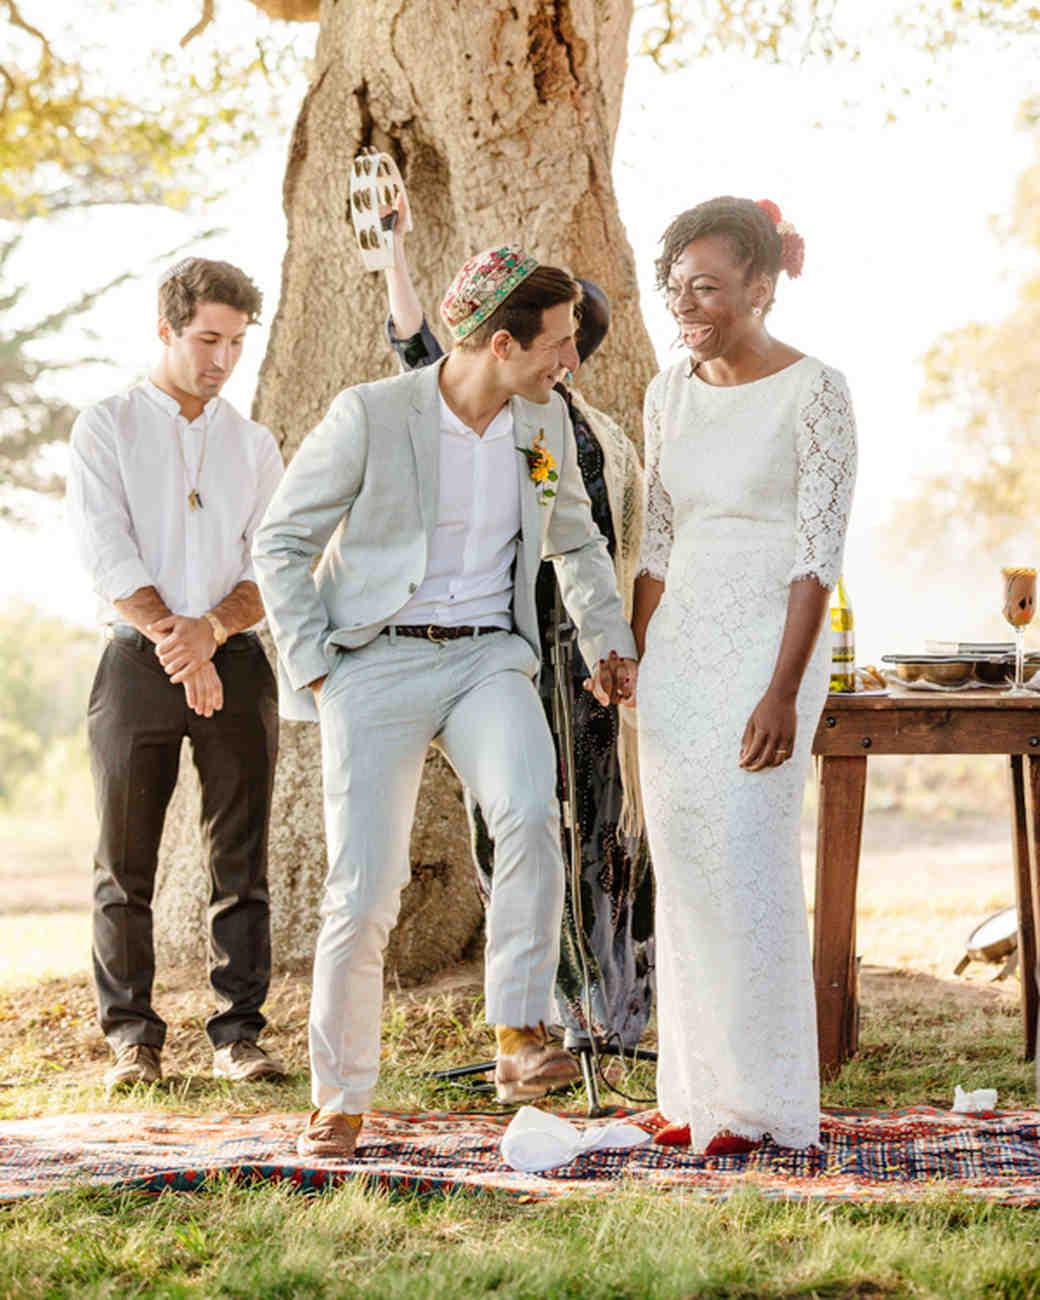 erica-jordy-wedding-ceremony-3741-s111971-0715.jpg